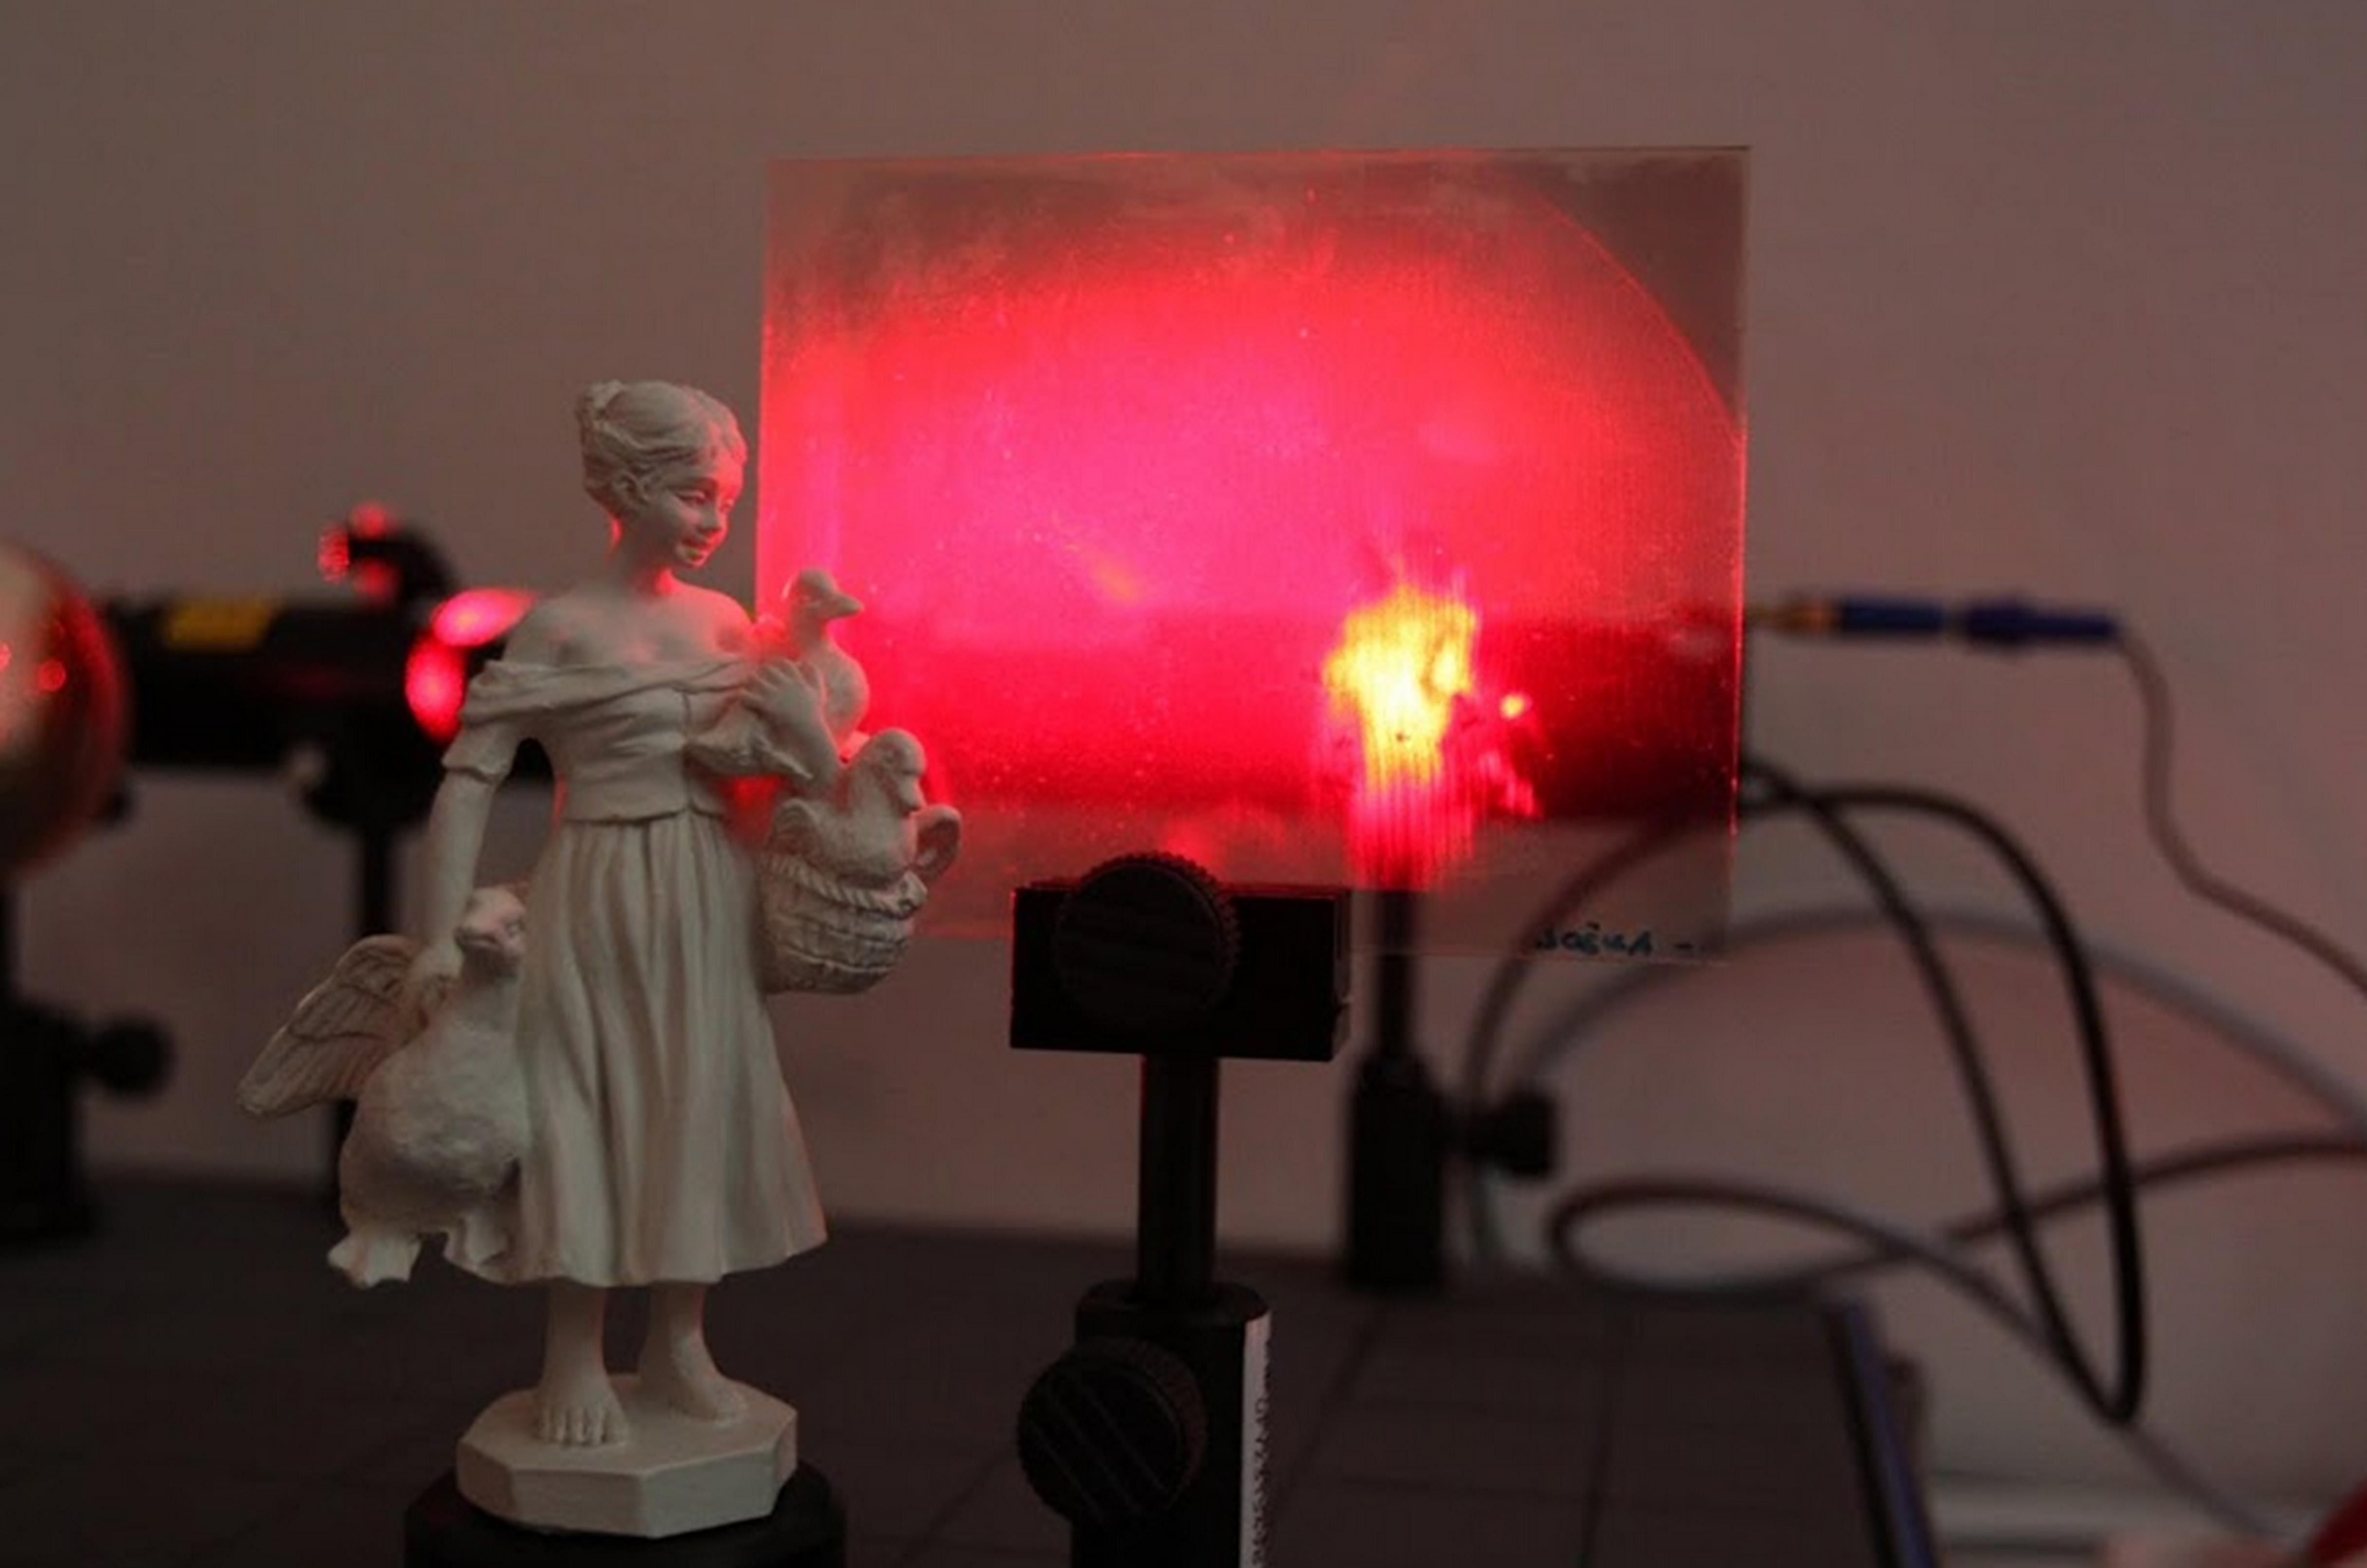 Laboratoř nanometrologie - Záznam a rekonstrukce hologramu